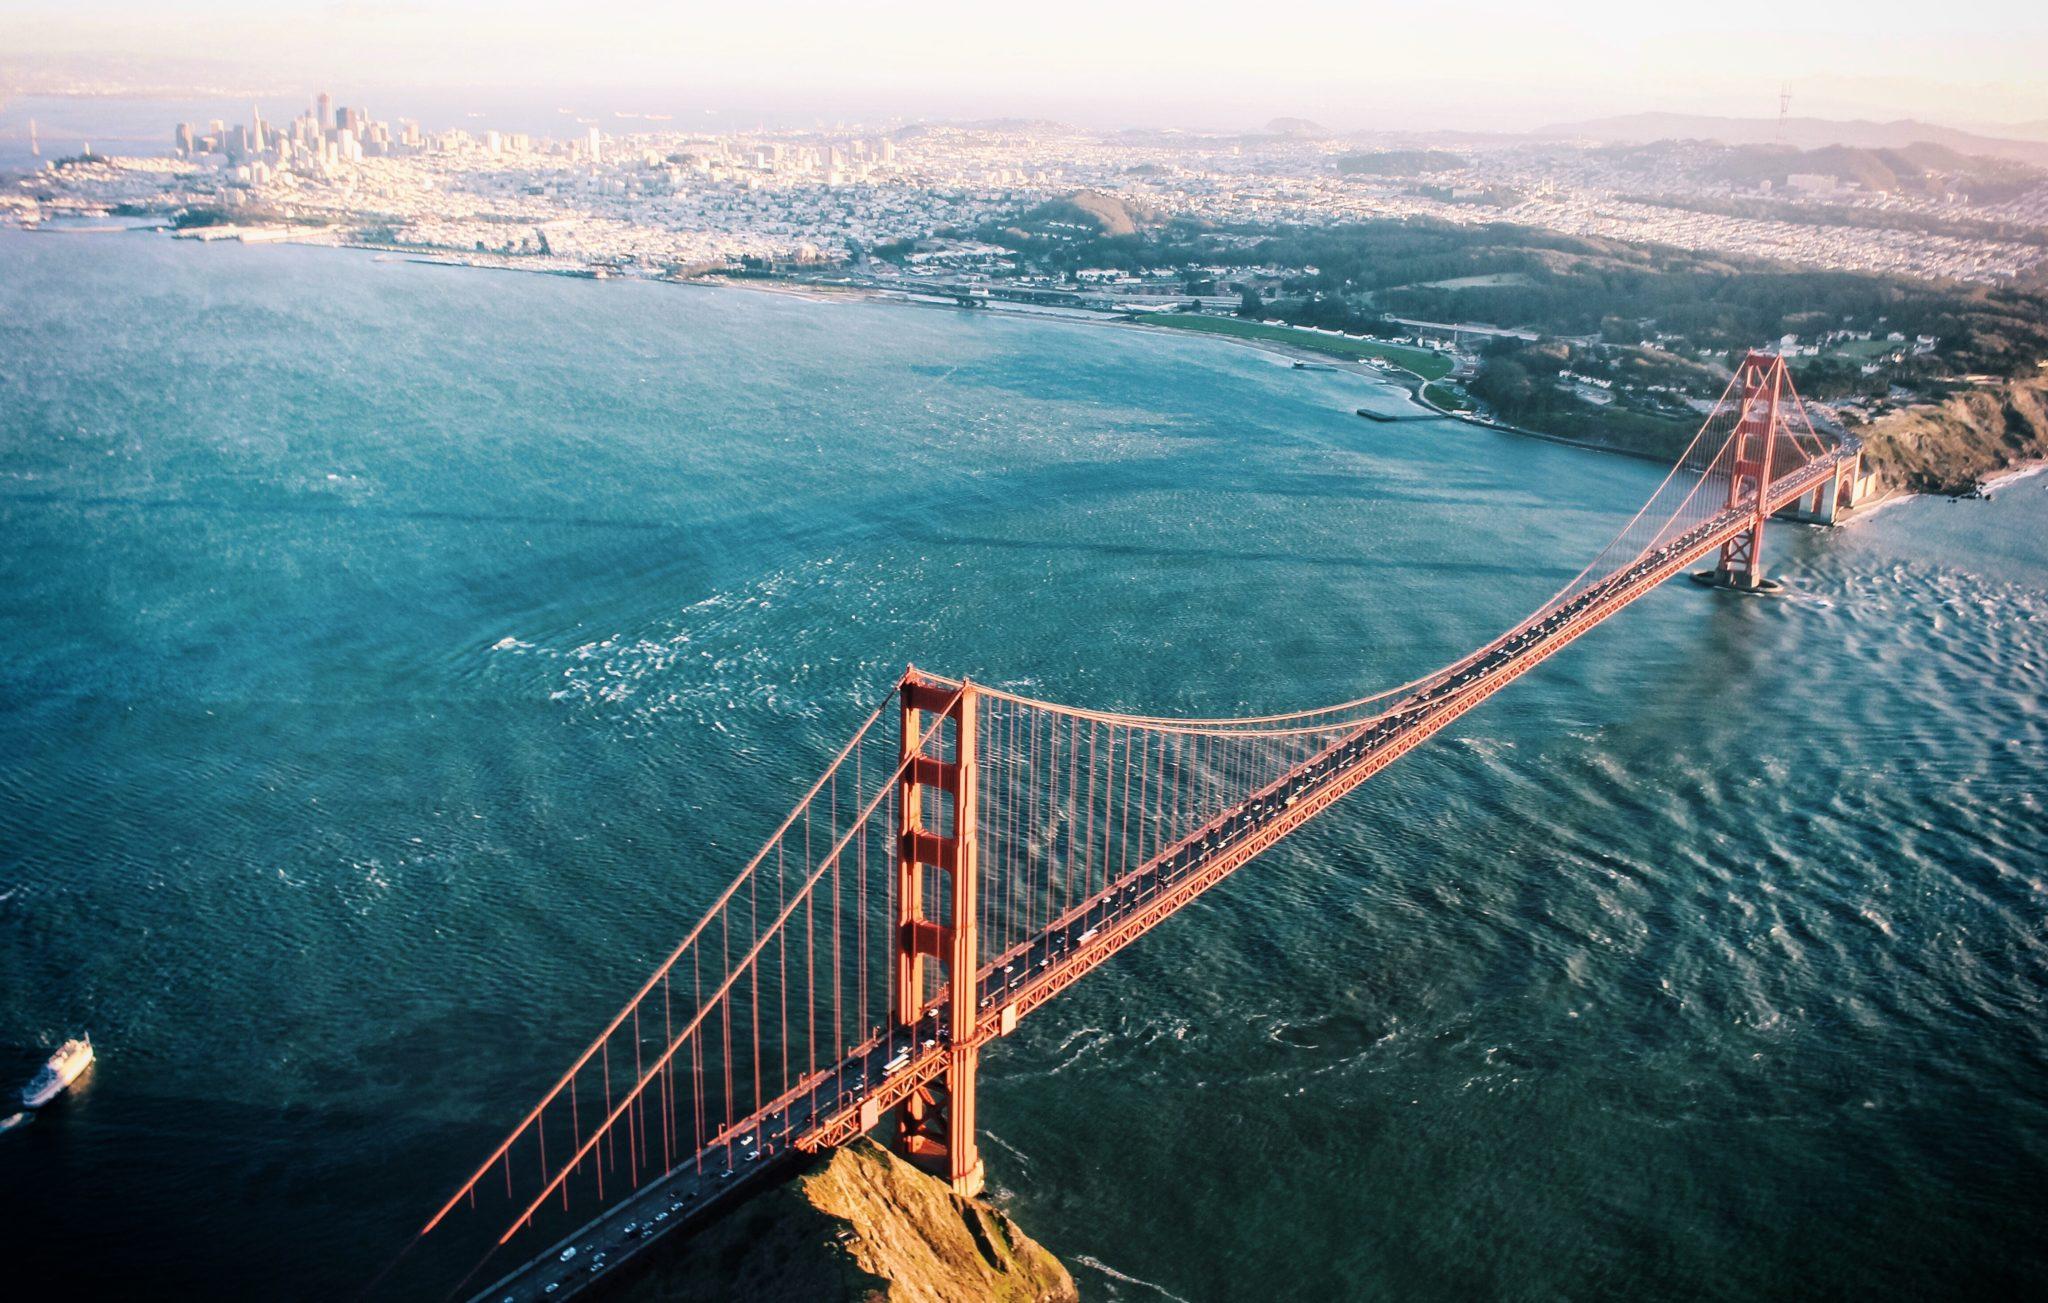 San Francisco Bay Area Aerial View